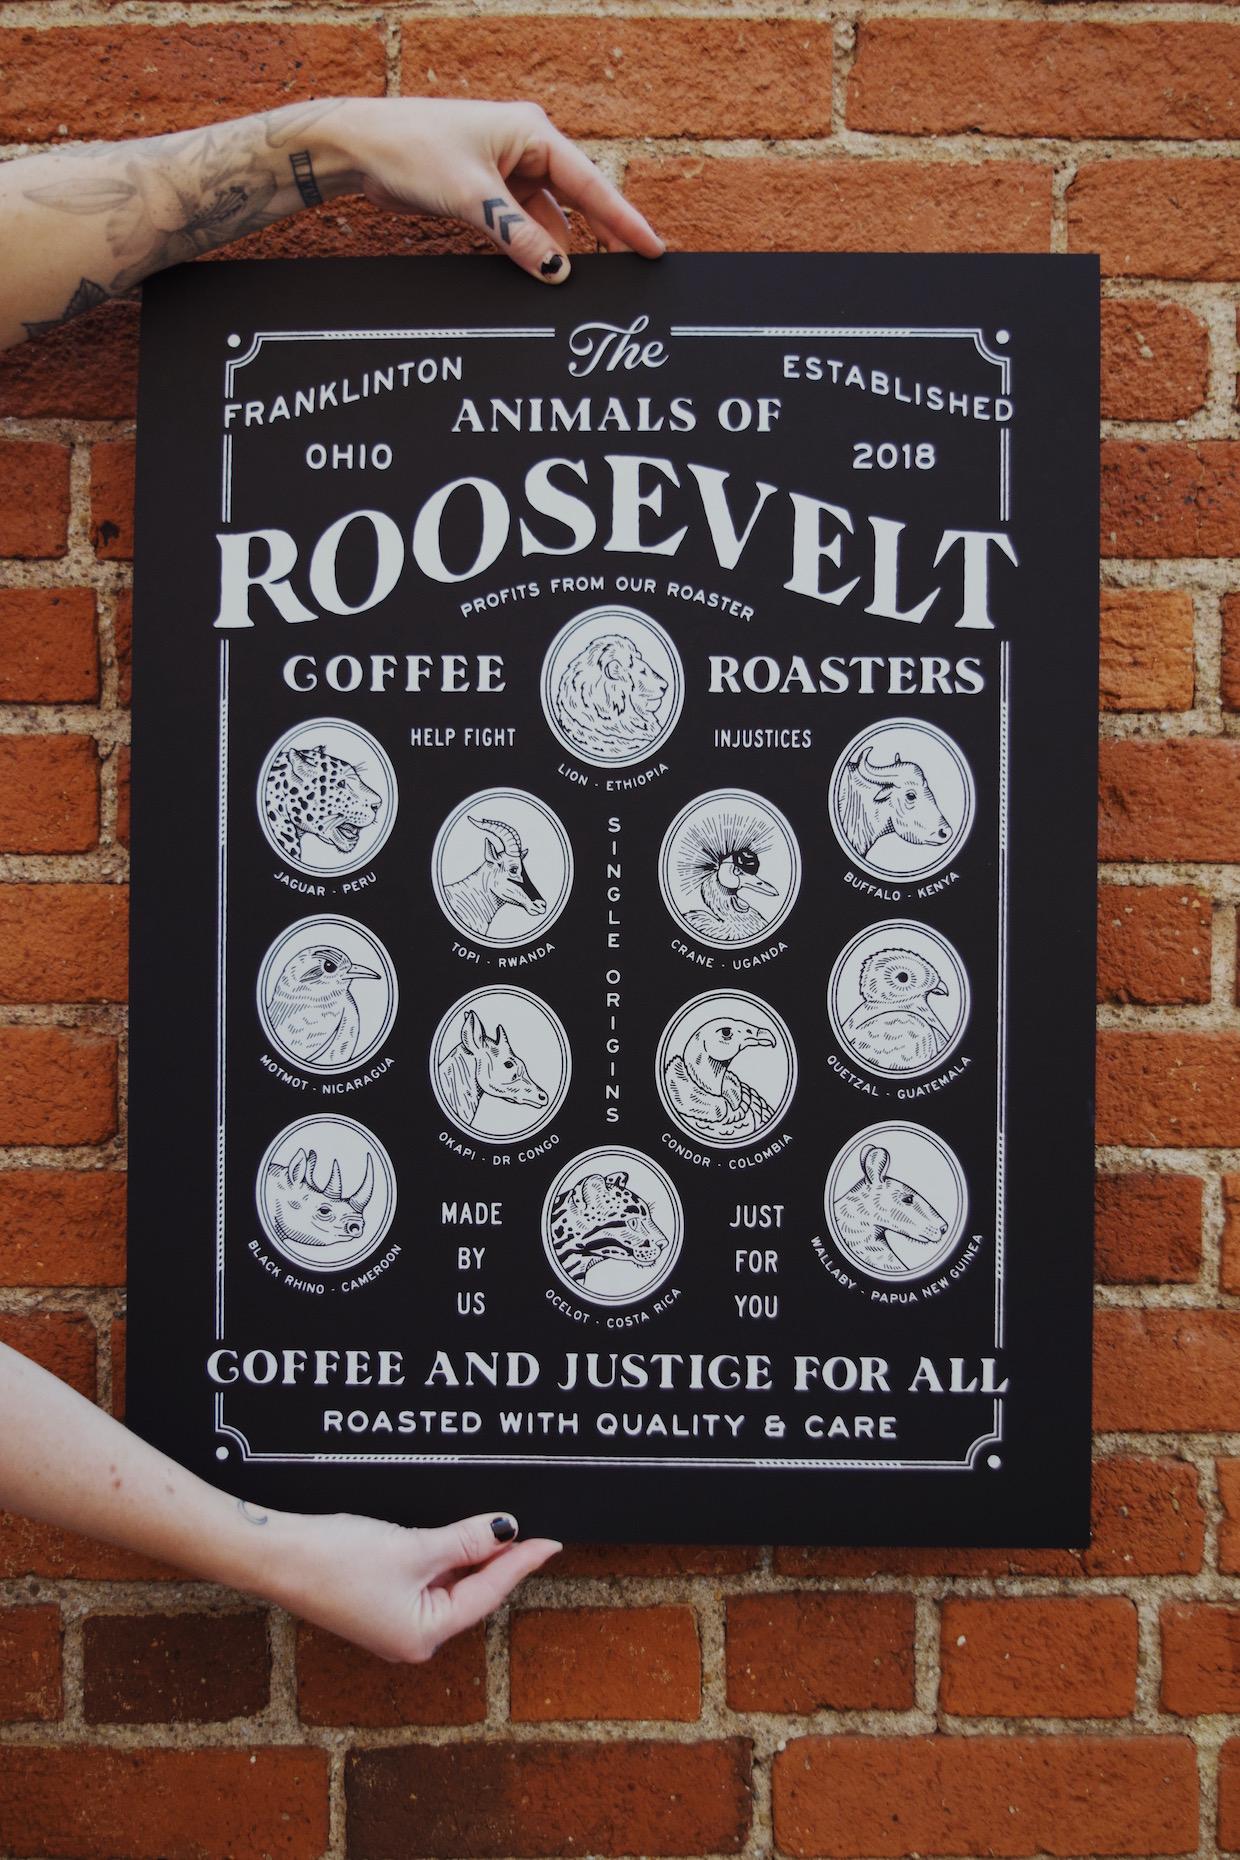 Roosevelt_coffee_brand